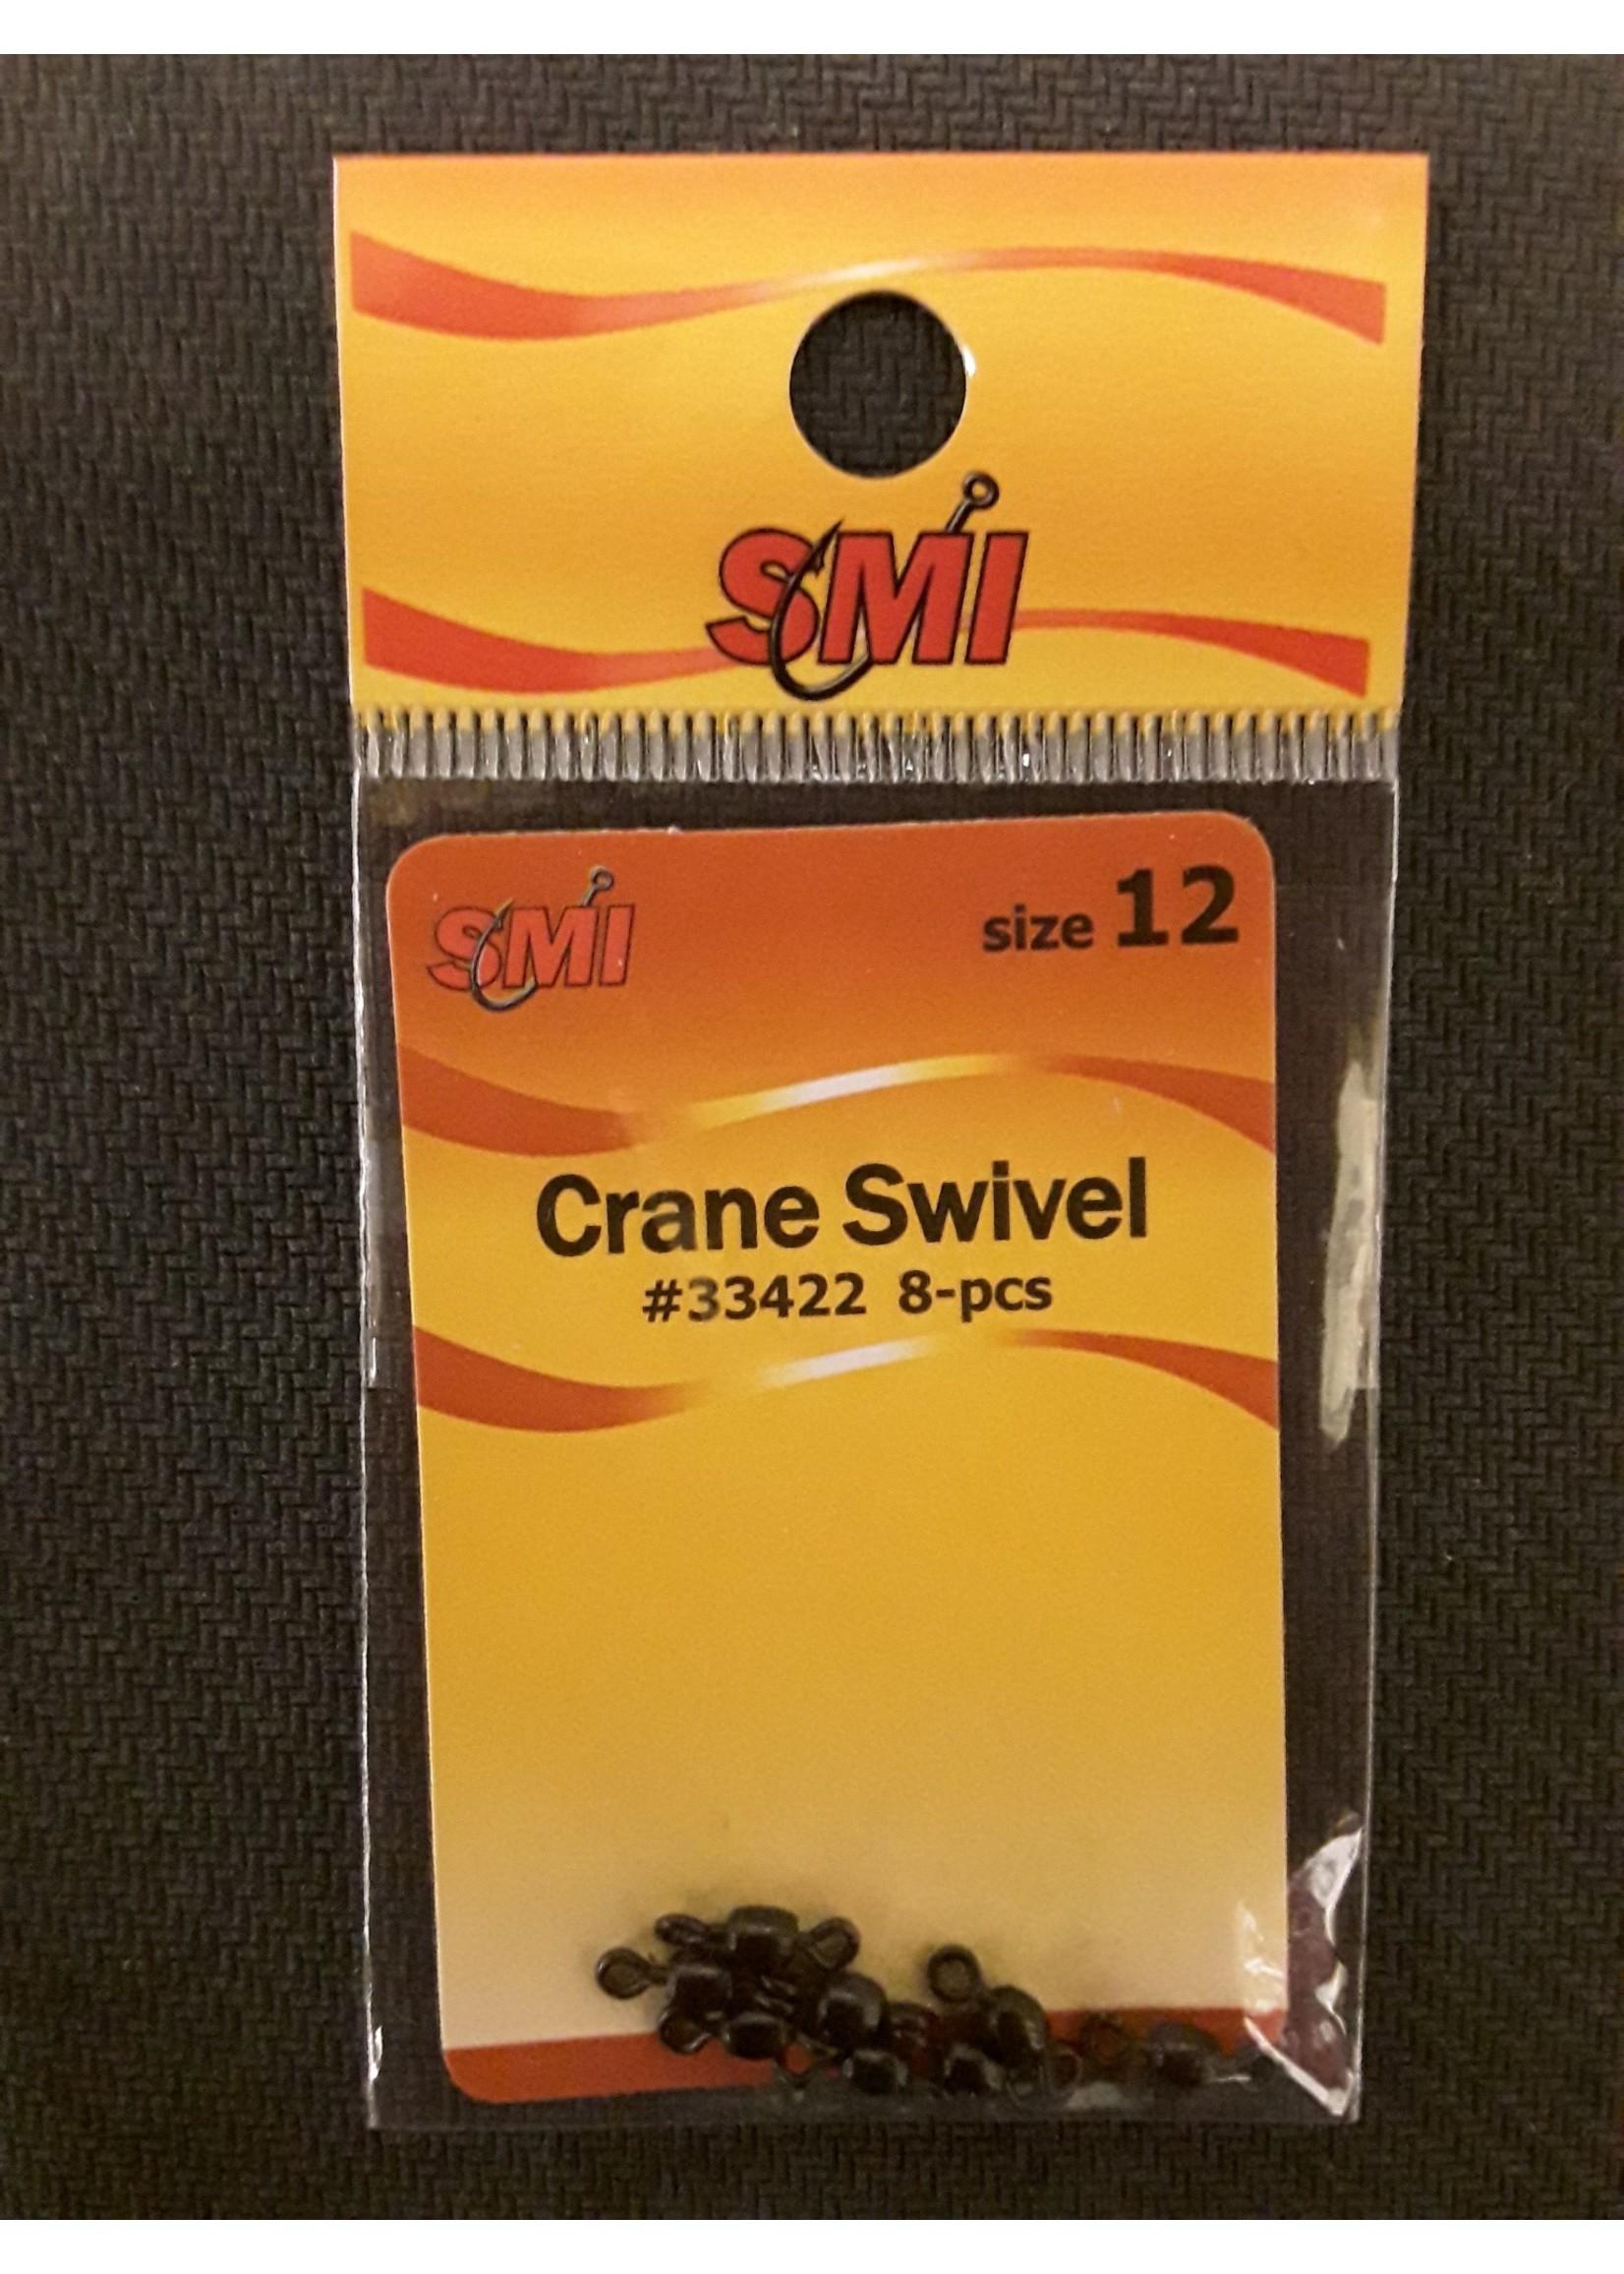 SMI Swivels Crane Black